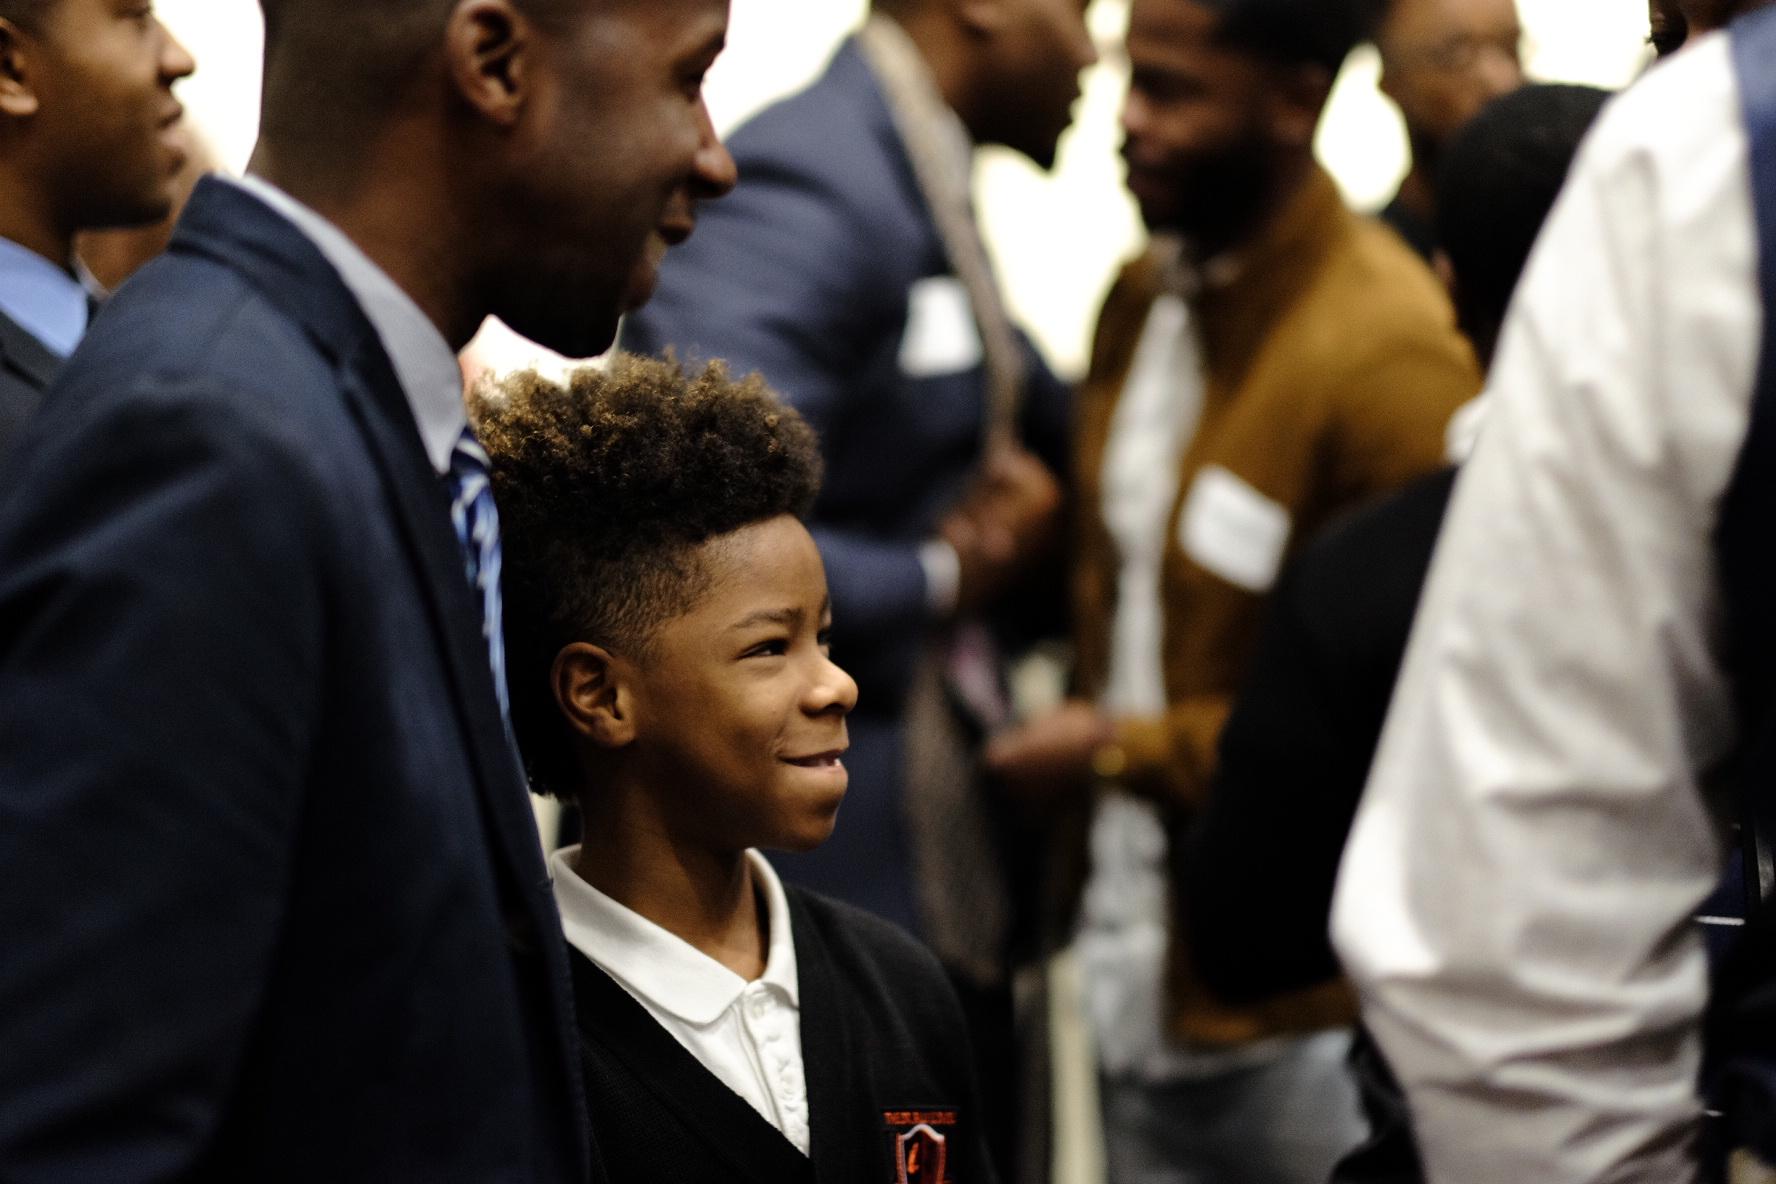 BWD - Kid smiling.jpeg